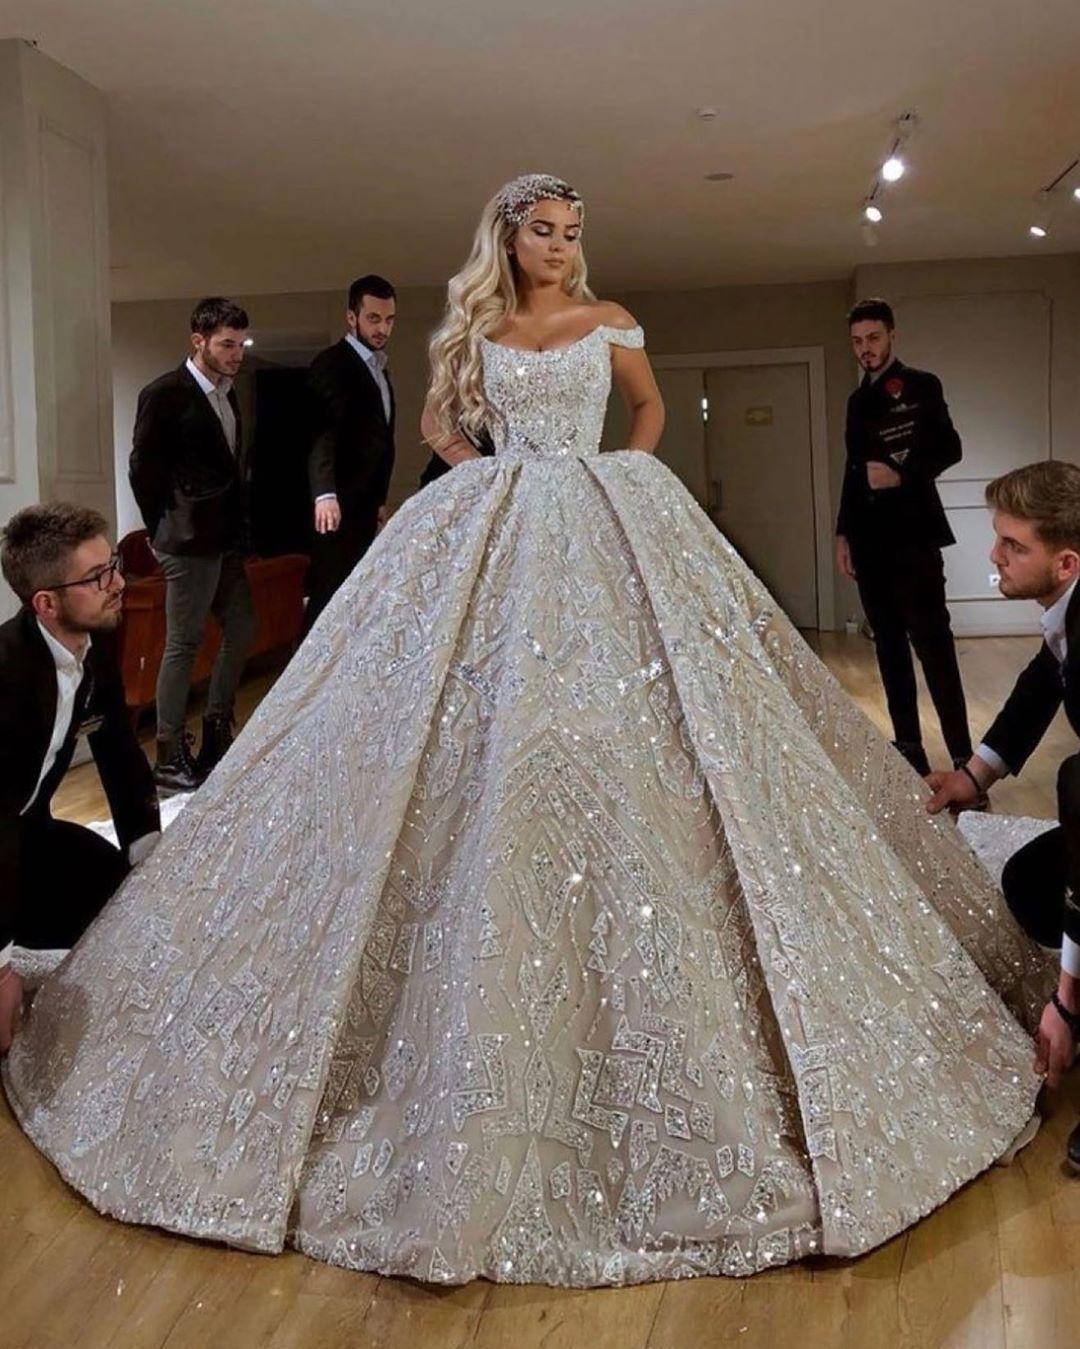 جده الرياض عروس ستايل فاشن ازياء القصيم اناقه فساتين زواجات Vi In 2020 Perfect Wedding Dress Gorgeous Dresses Princess Wedding Dresses